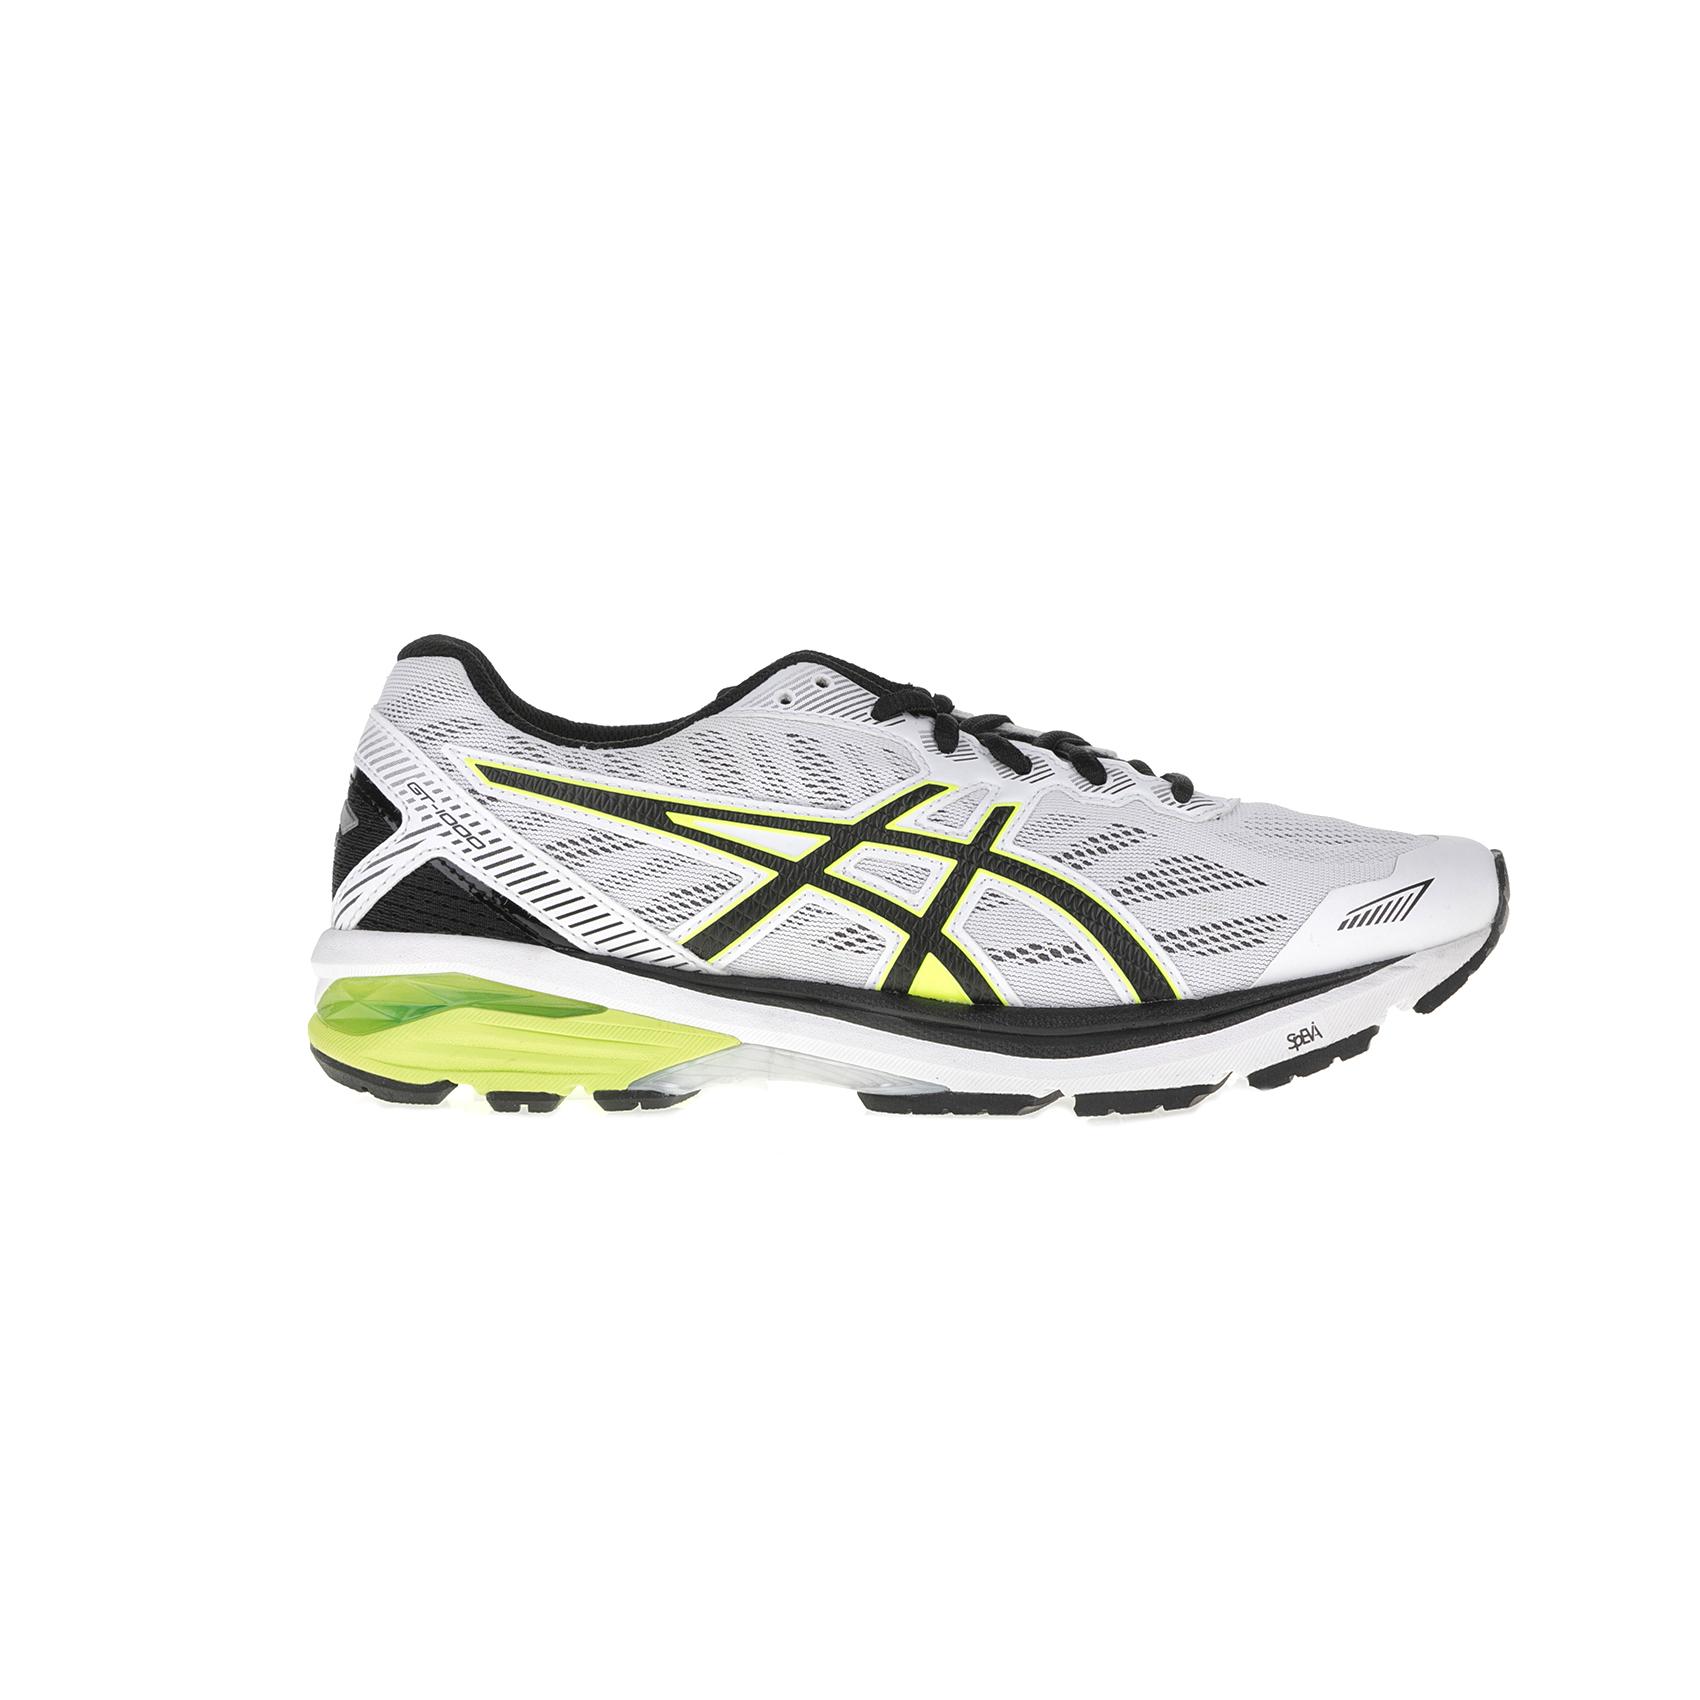 ASICS - Ανδρικά αθλητικά παπούτσια ASICS GT-1000 5 λευκά ανδρικά παπούτσια αθλητικά running